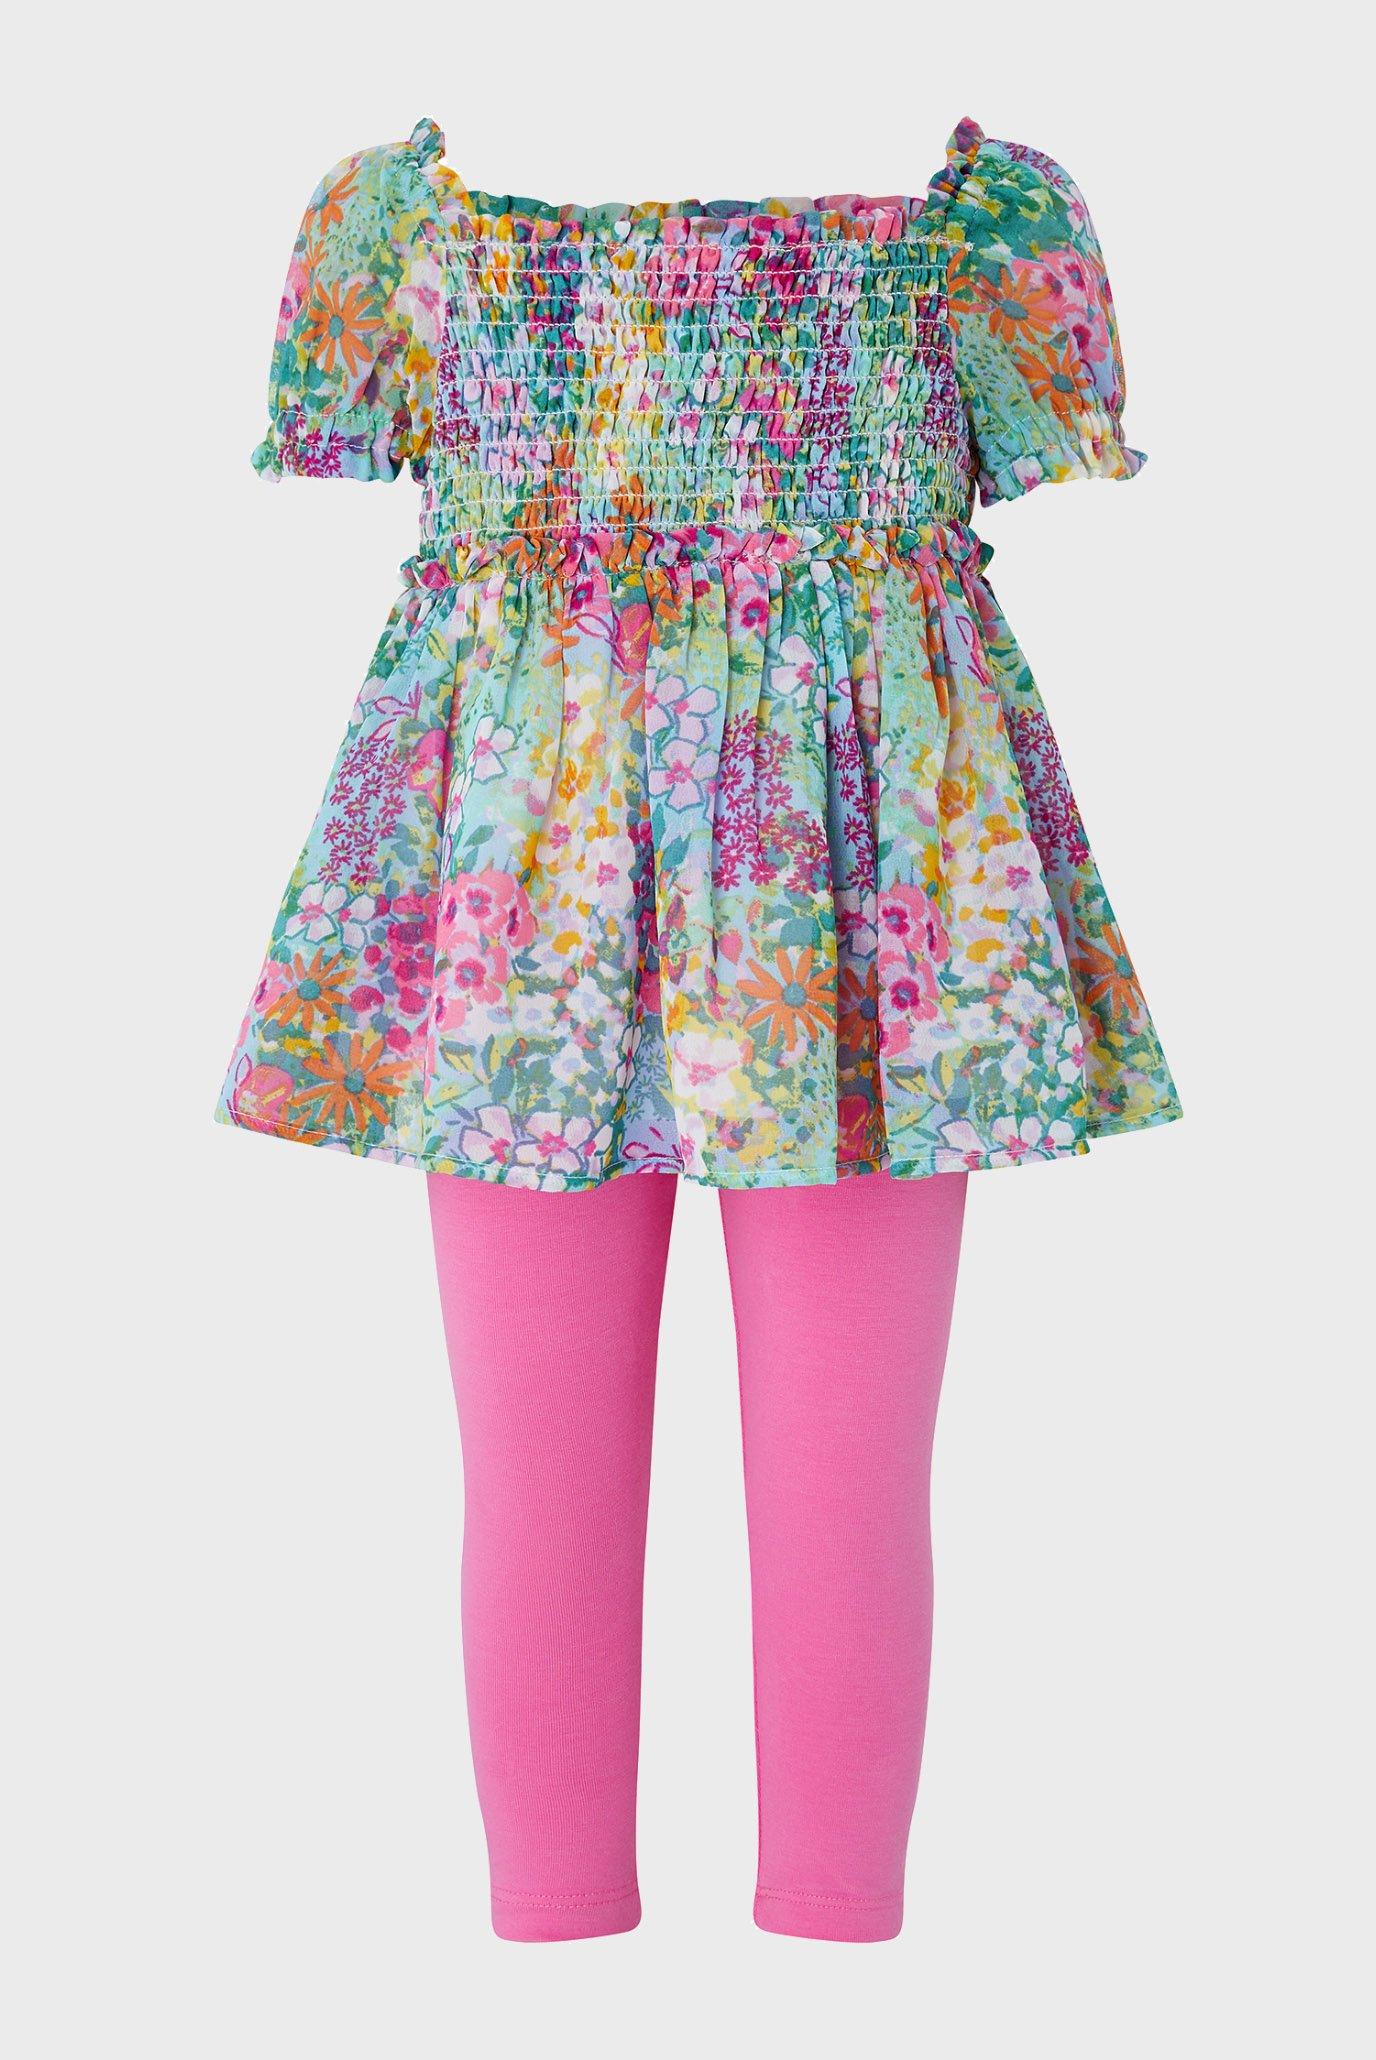 Дитячий комплект одягу S.E.W. BABY FLORAL T (топ, легінси) 1